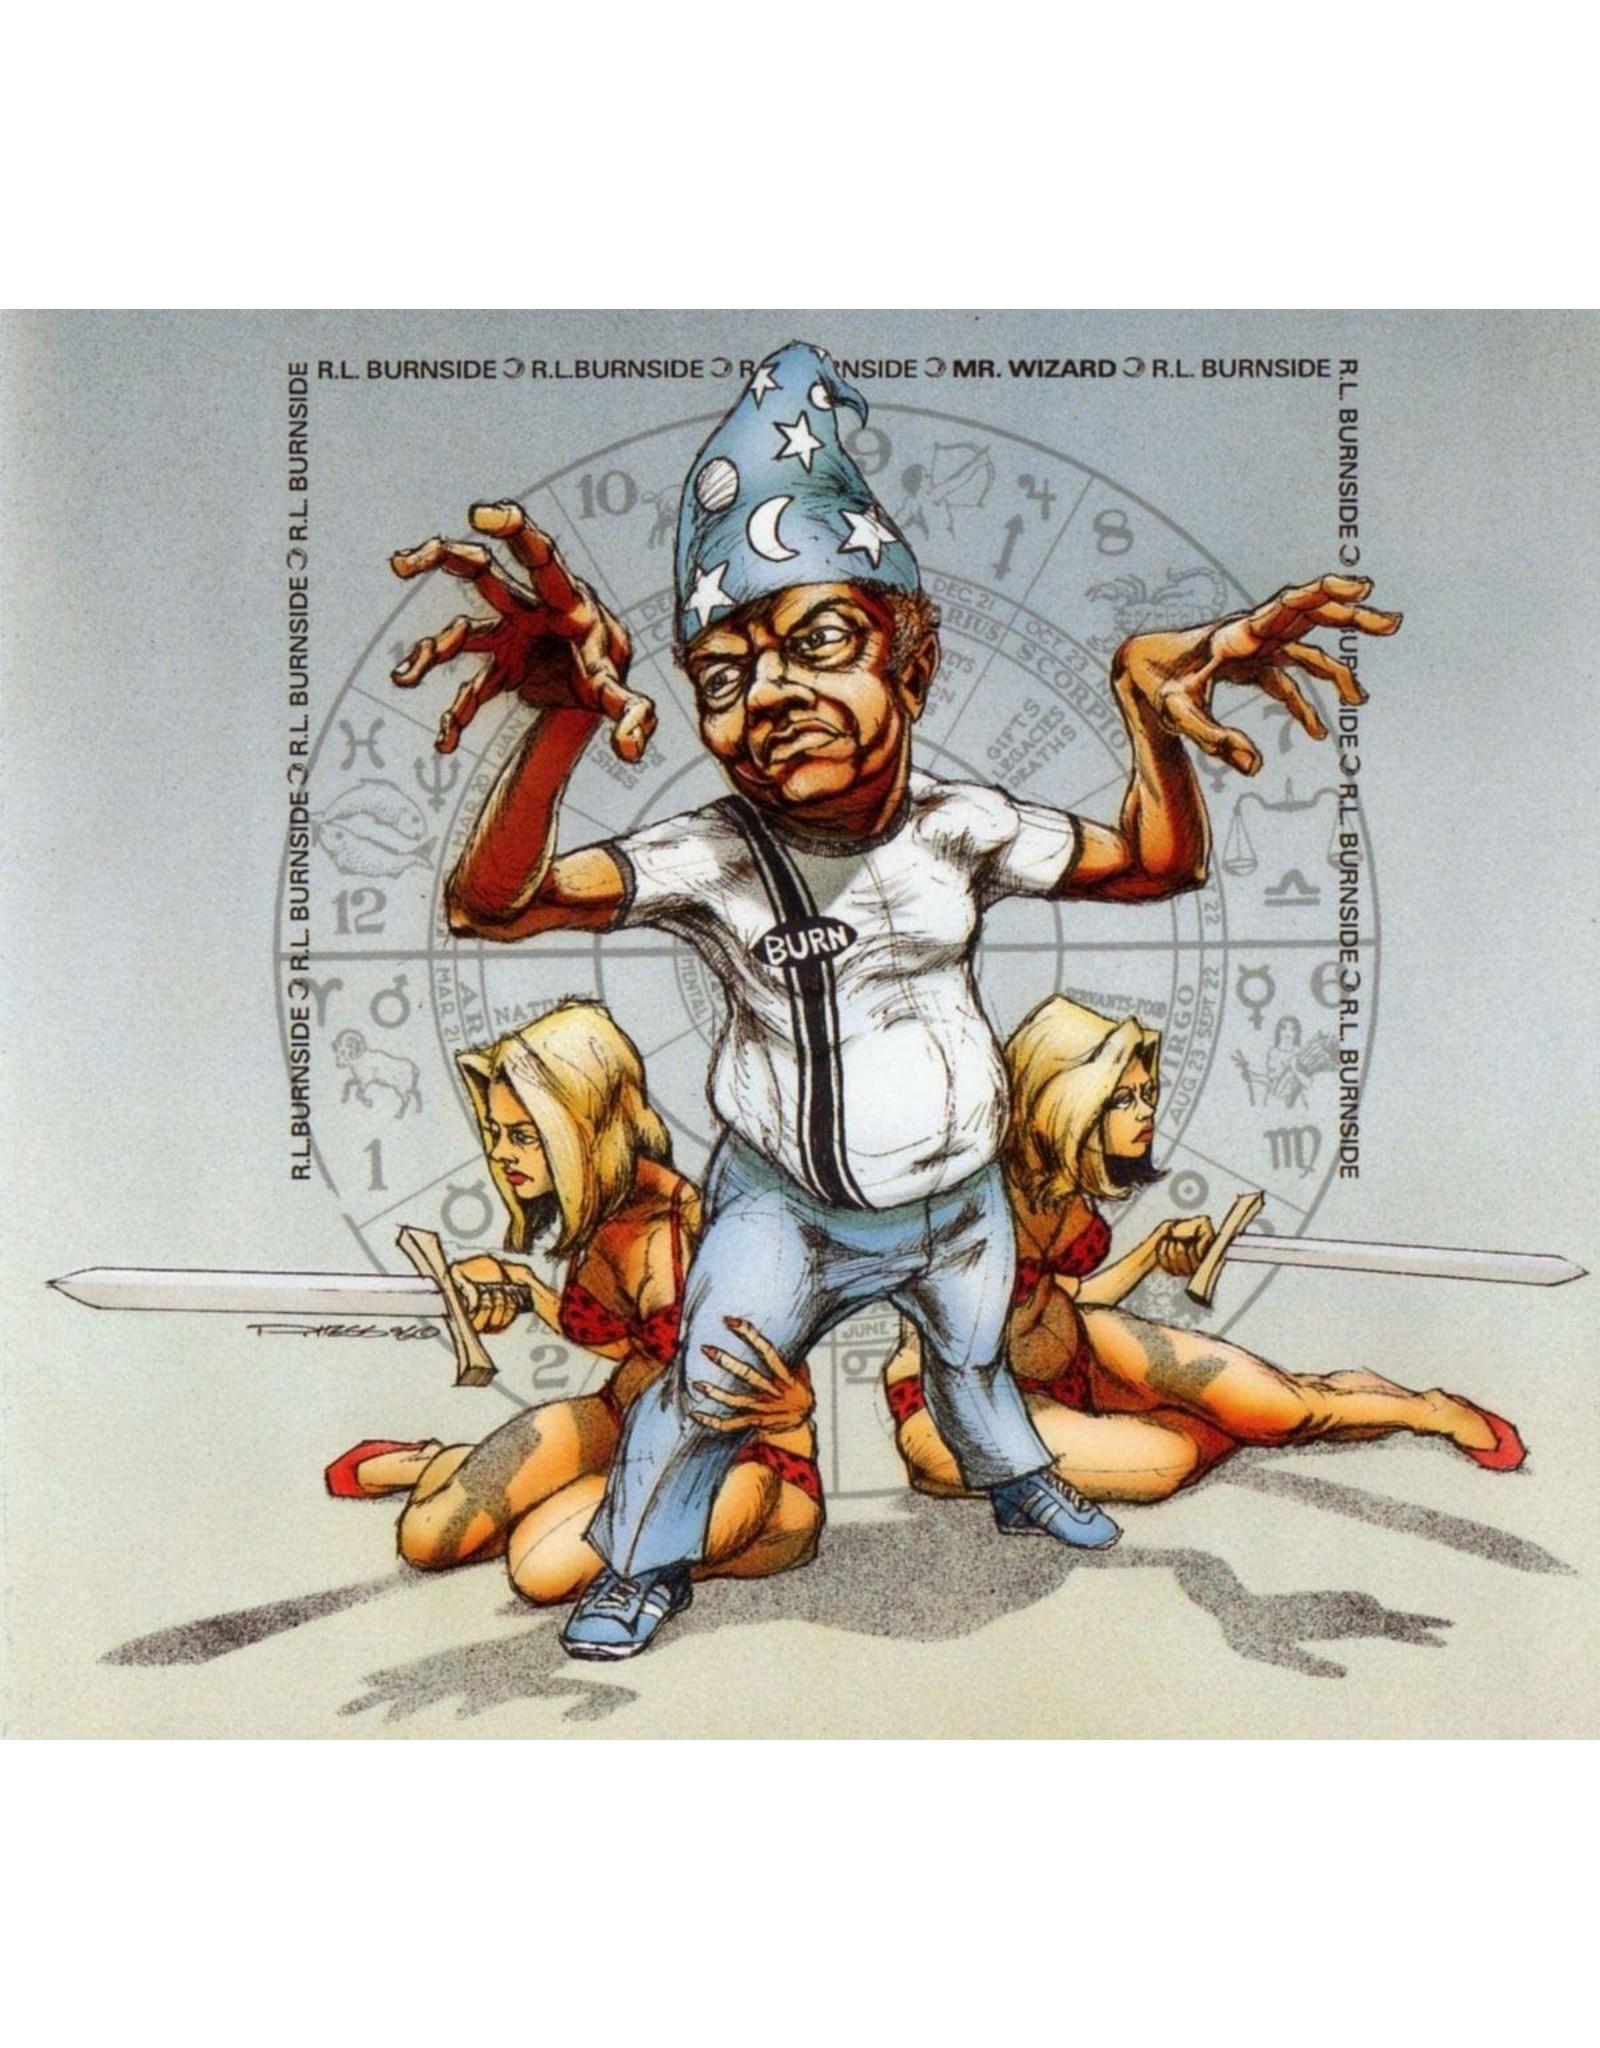 New Vinyl R.L. Burnside - Mr. Wizard LP